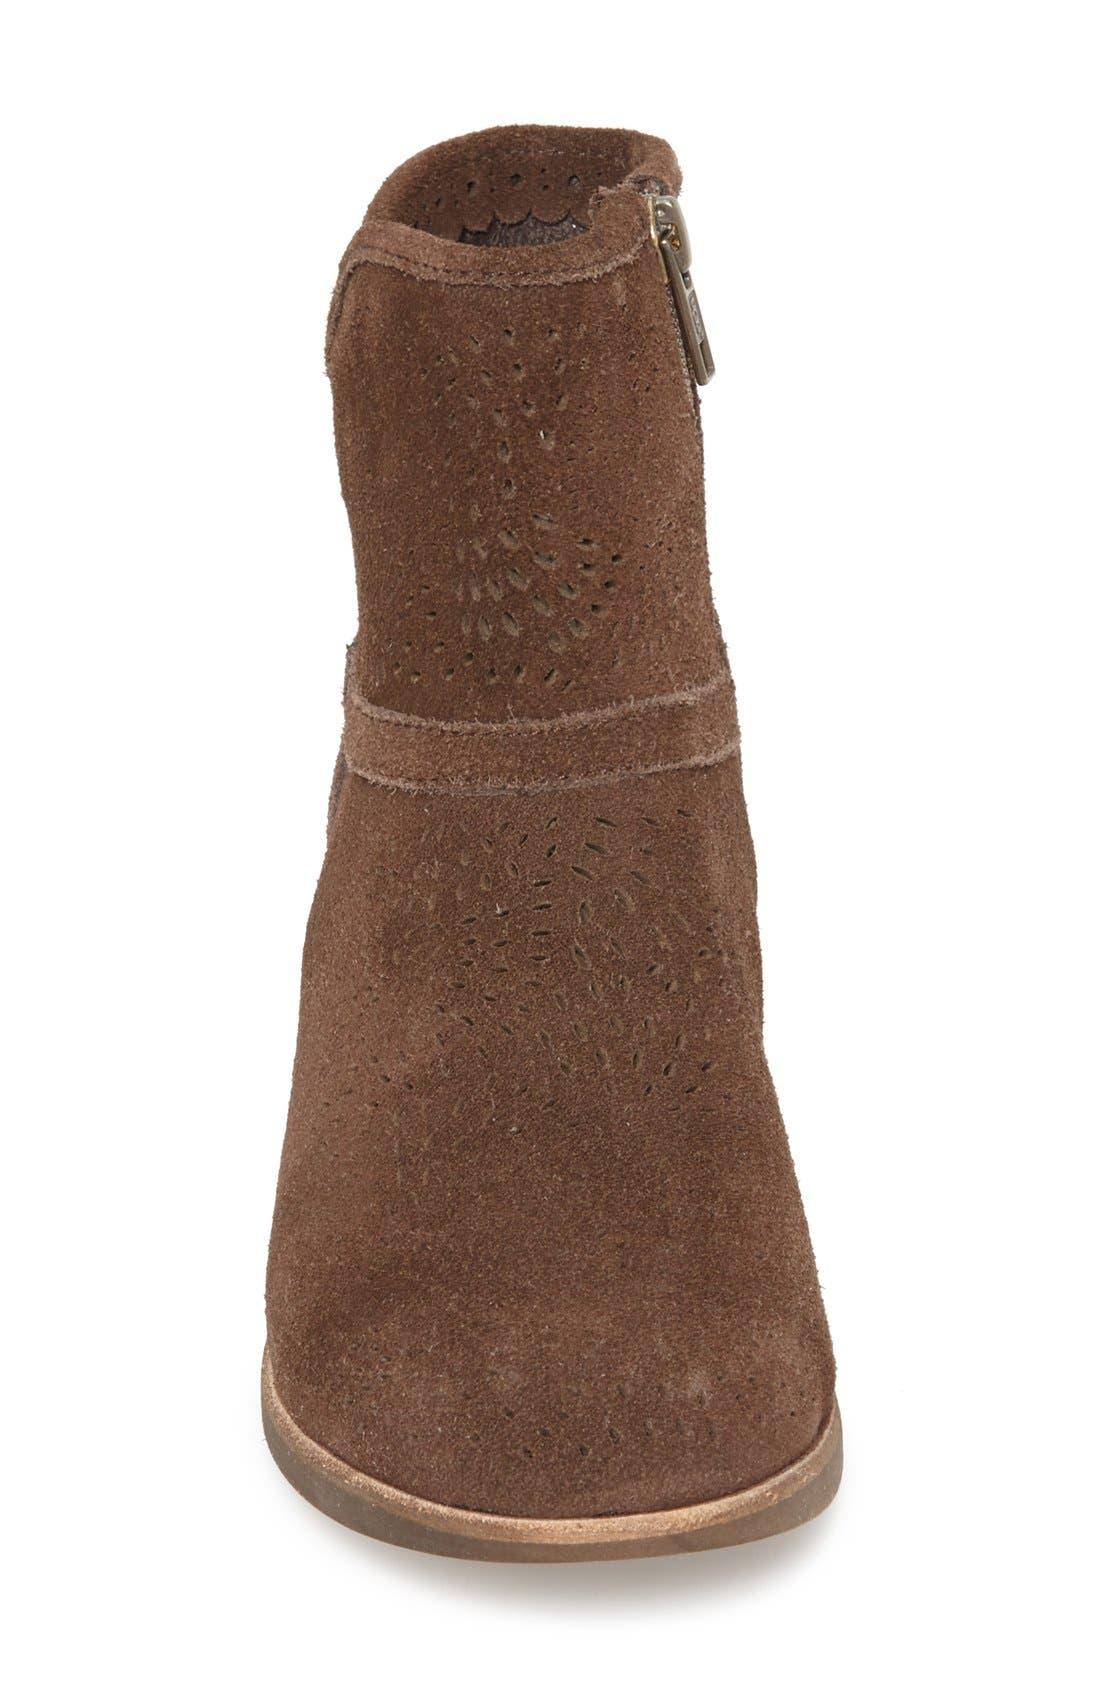 Alternate Image 3  - UGG® Australia 'Darling Seaweed' Perforated Suede Boot (Women)